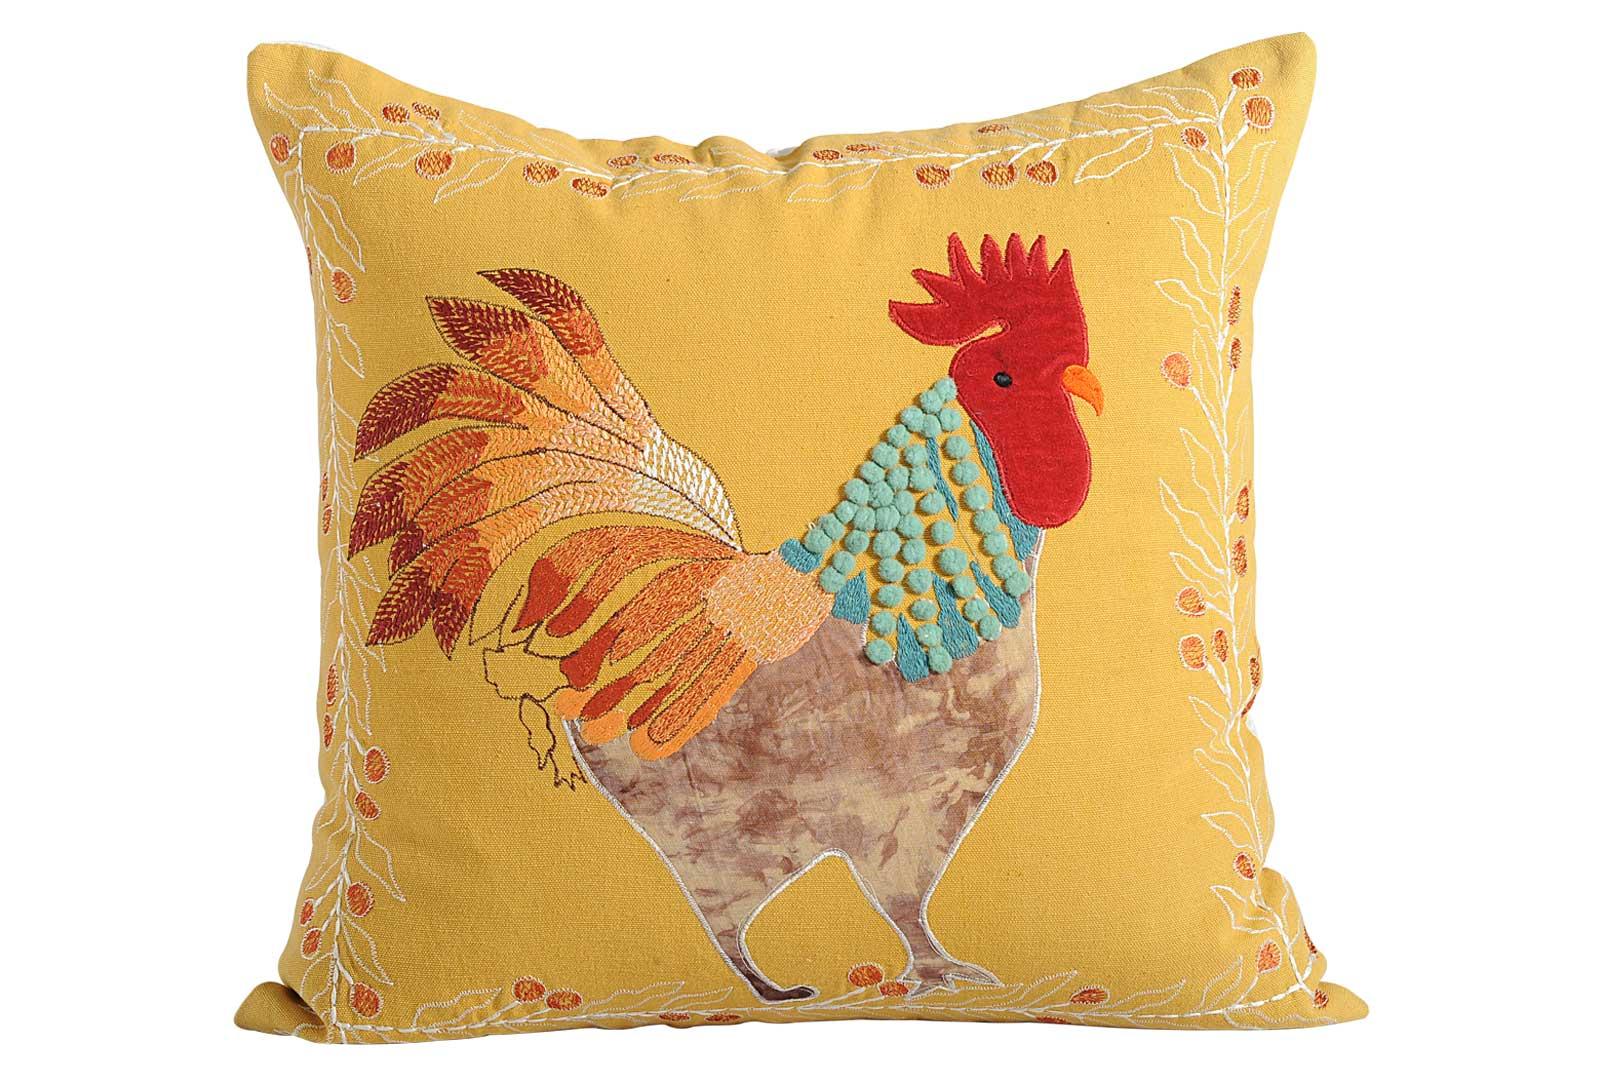 Cock Design Cushion